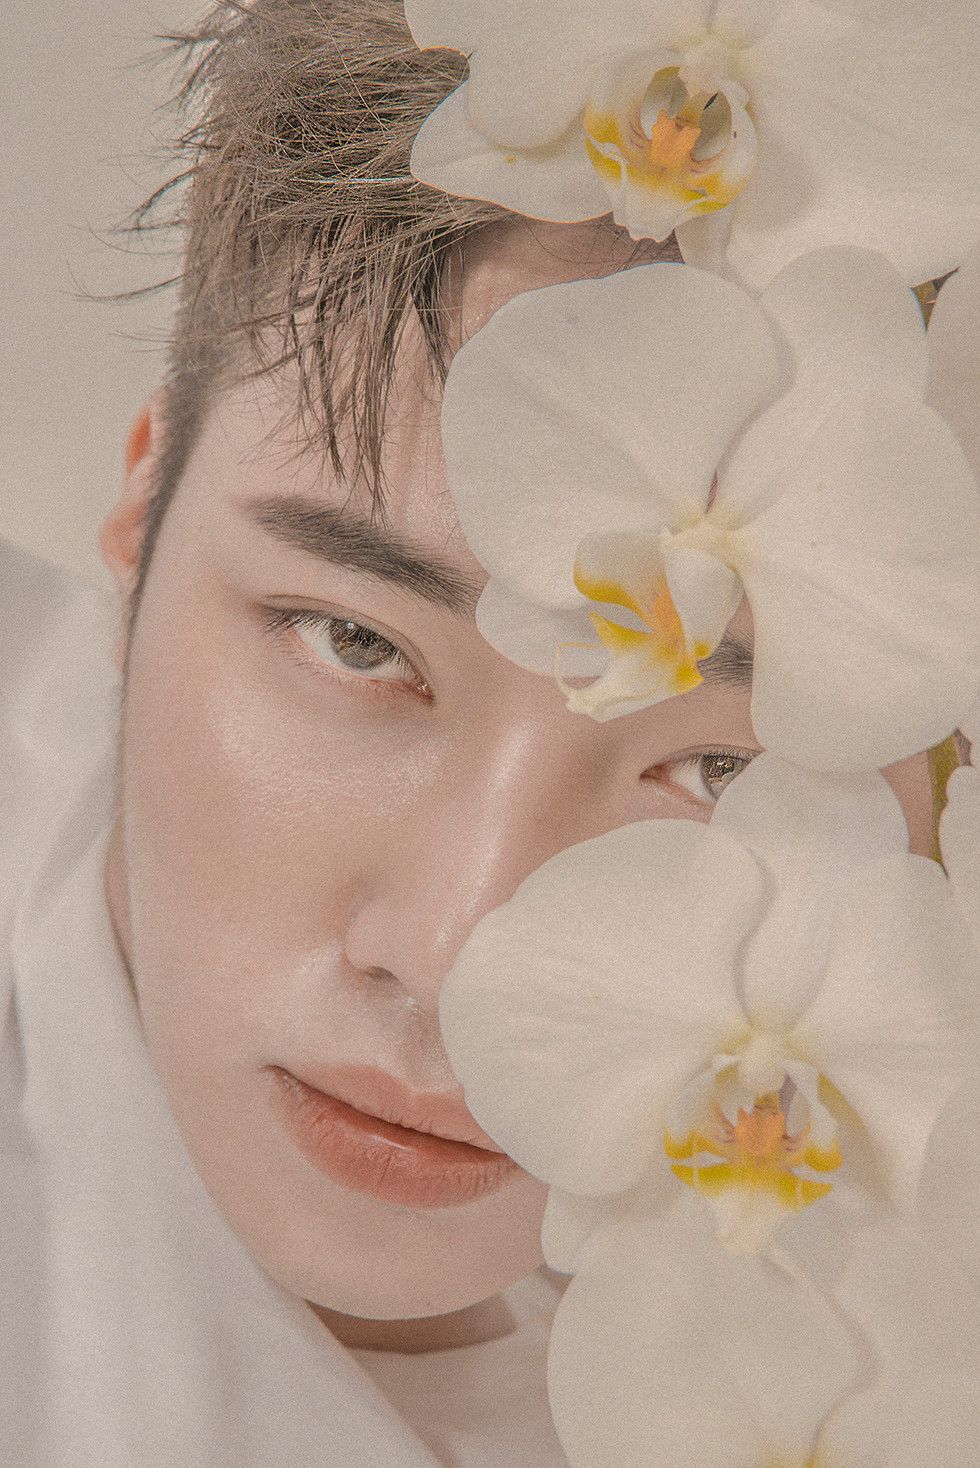 boy_Qyoung2.jpg